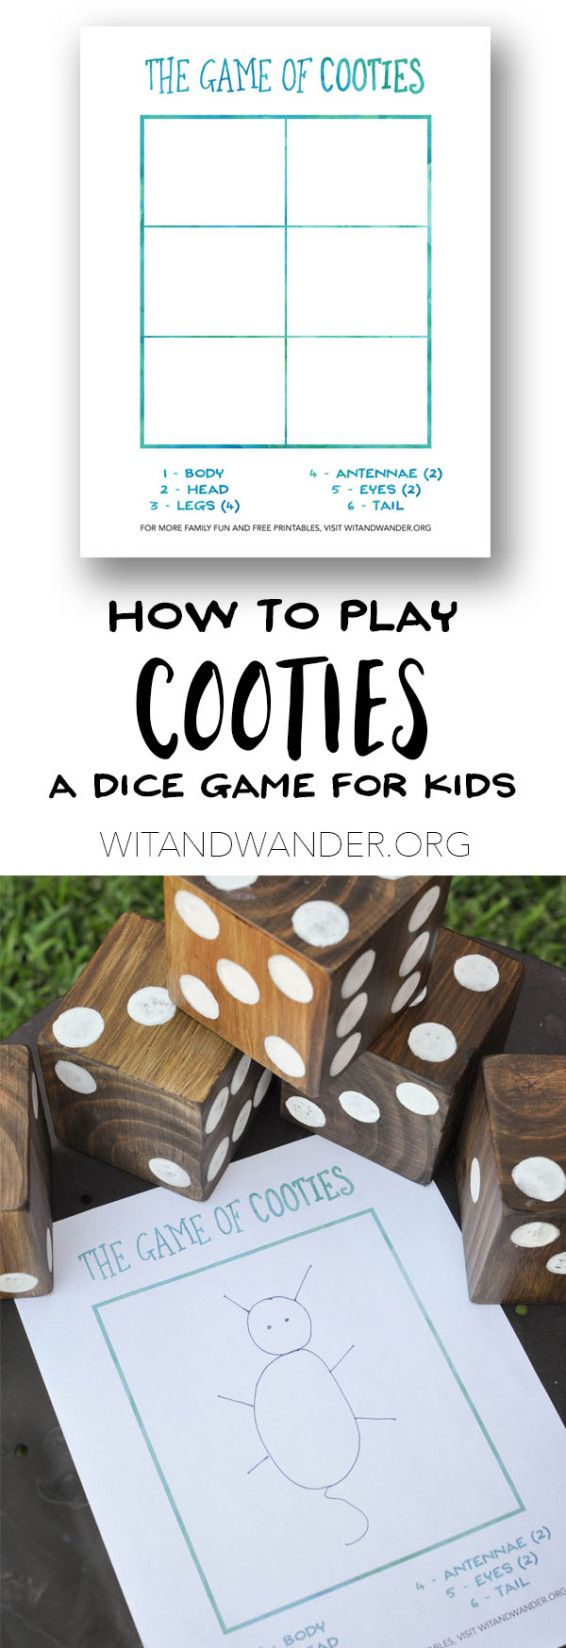 DIY Backyard Games and Free Printable Cooties Game - Wit & Wander